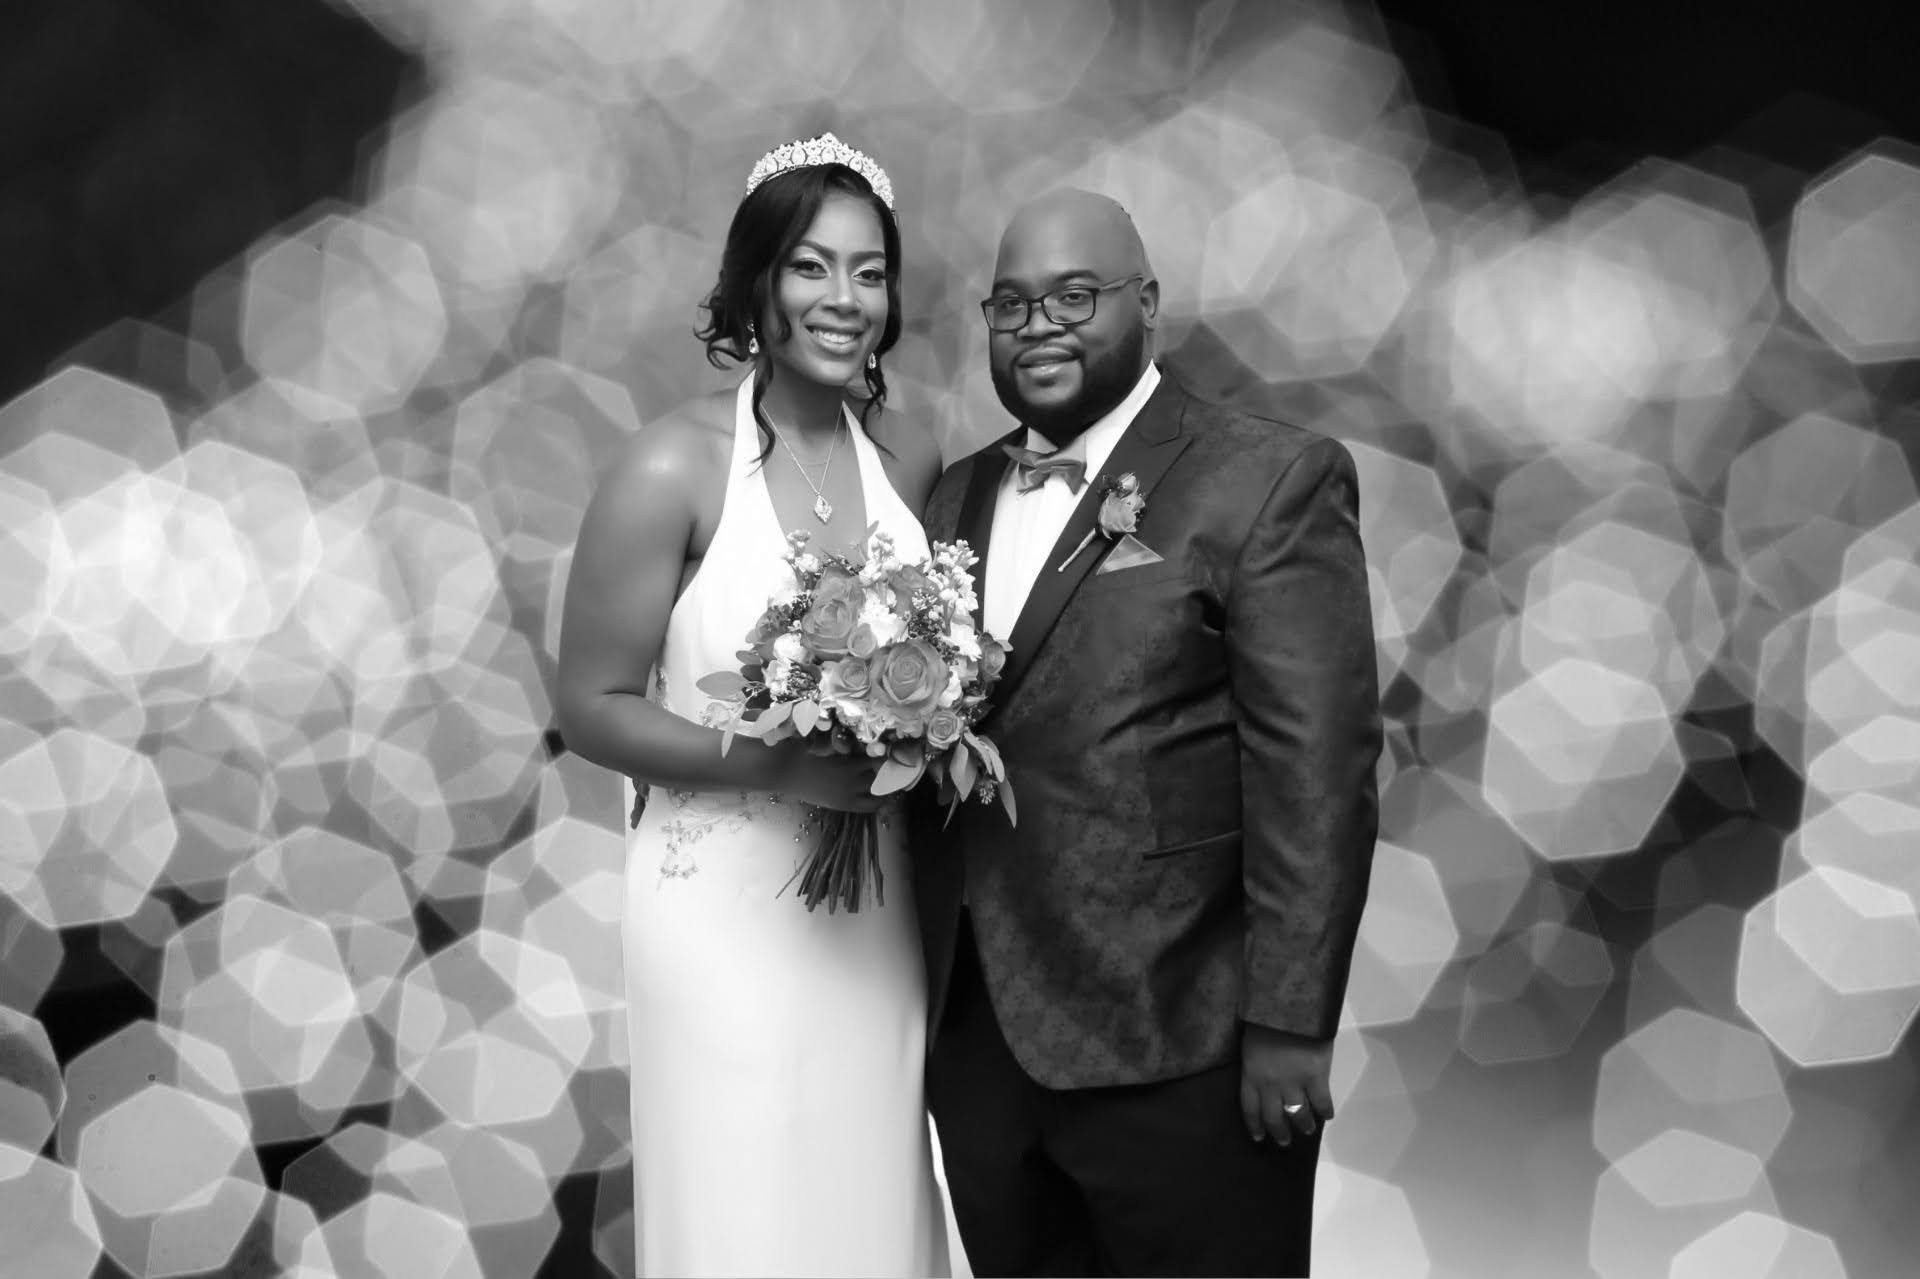 Flashlight Wedding Photography Package